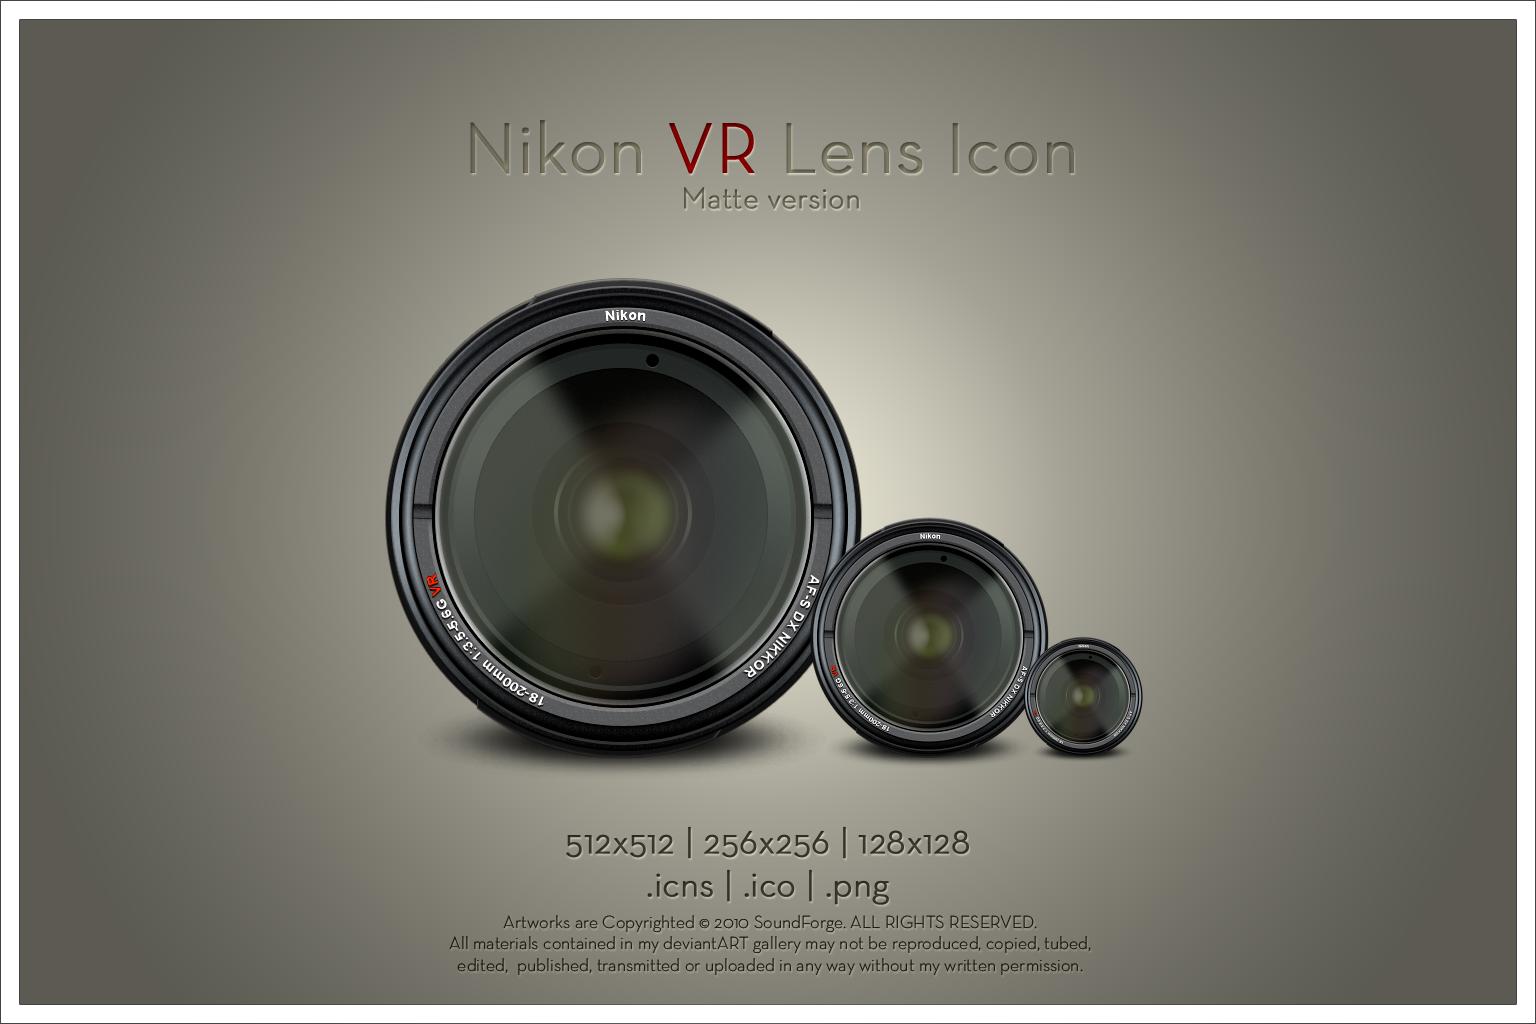 Nikon VR Lens Icon v1 by SoundForge